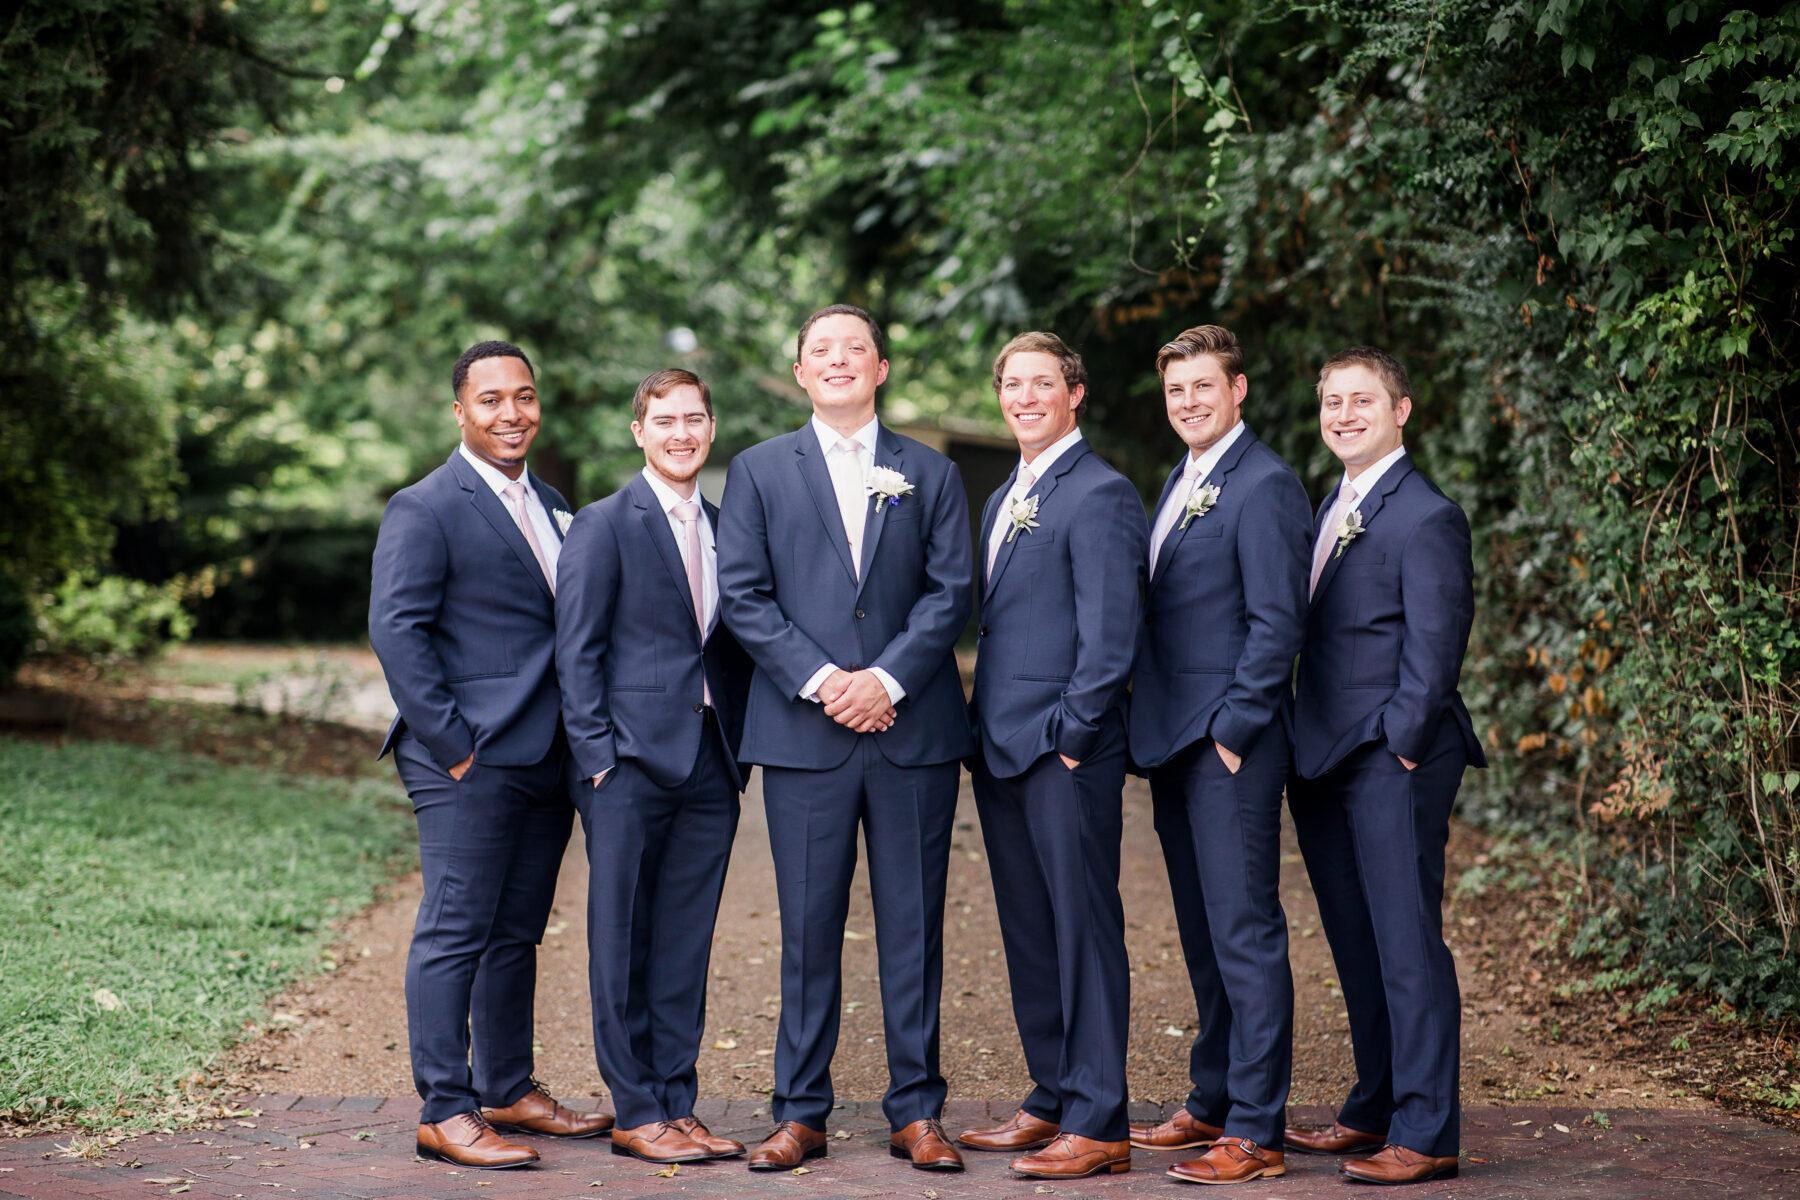 Navy wedding tuxedo from The Black Tux | Nashville Bride Guide